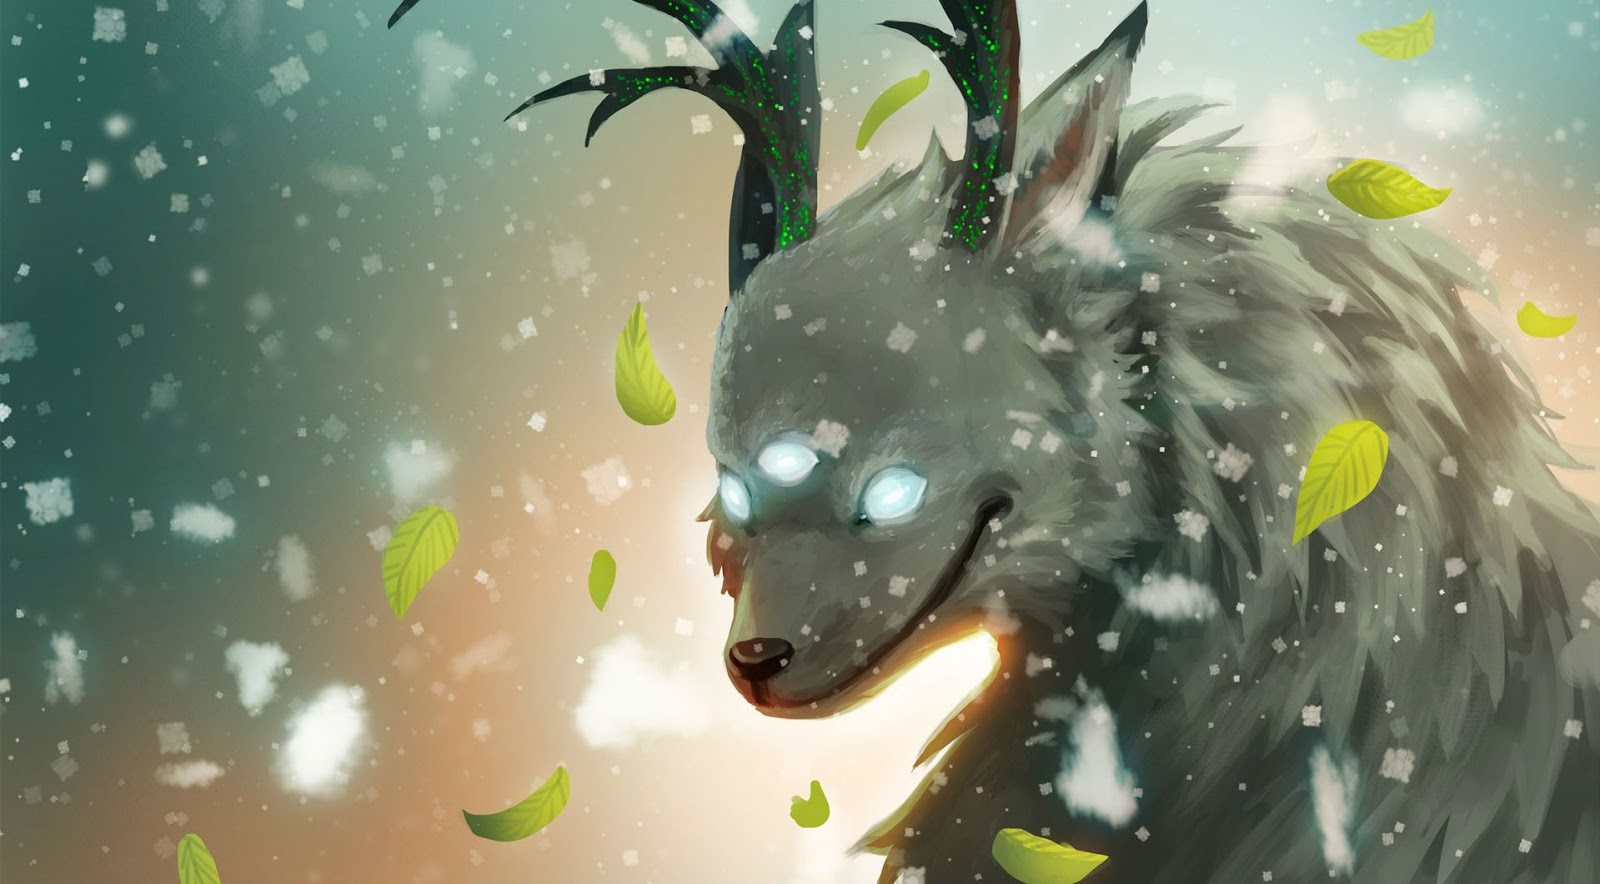 Abstract Wildlife White Snow Animals Fantasy Wallpaper Image